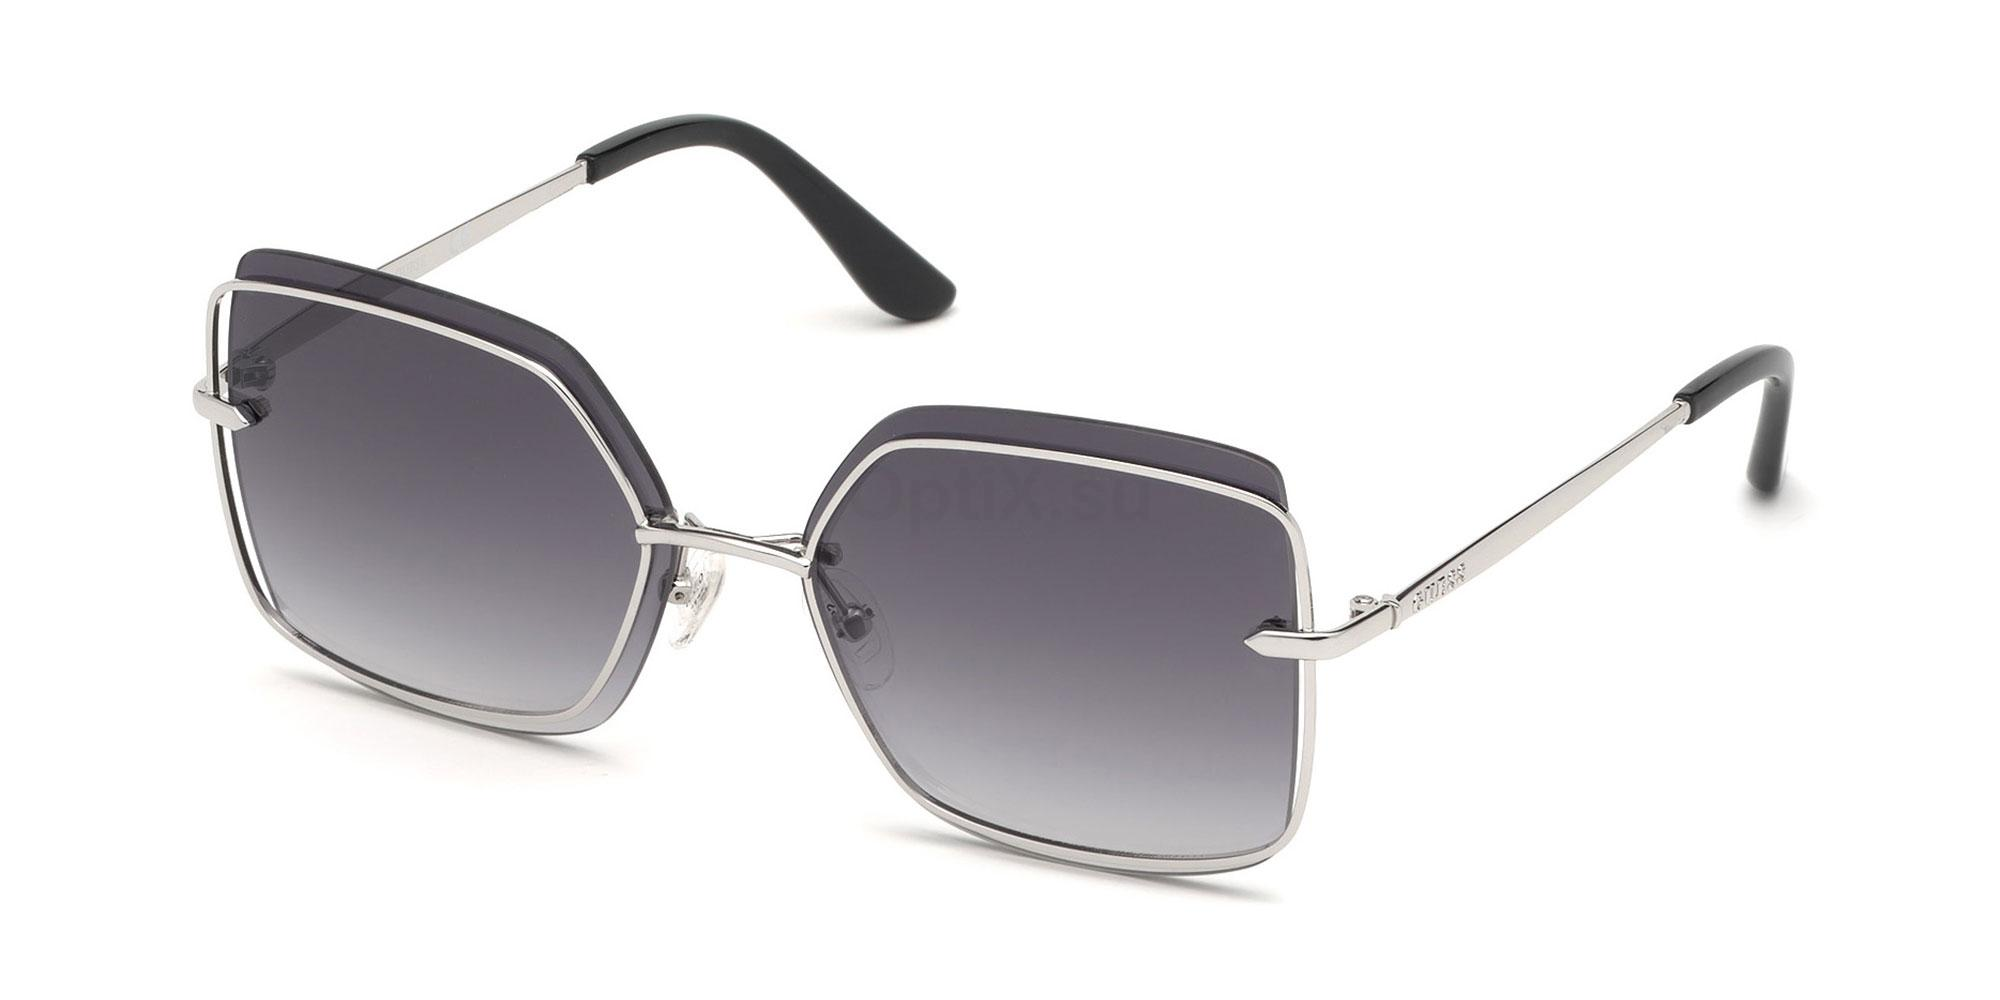 10B GU7618 Sunglasses, Guess